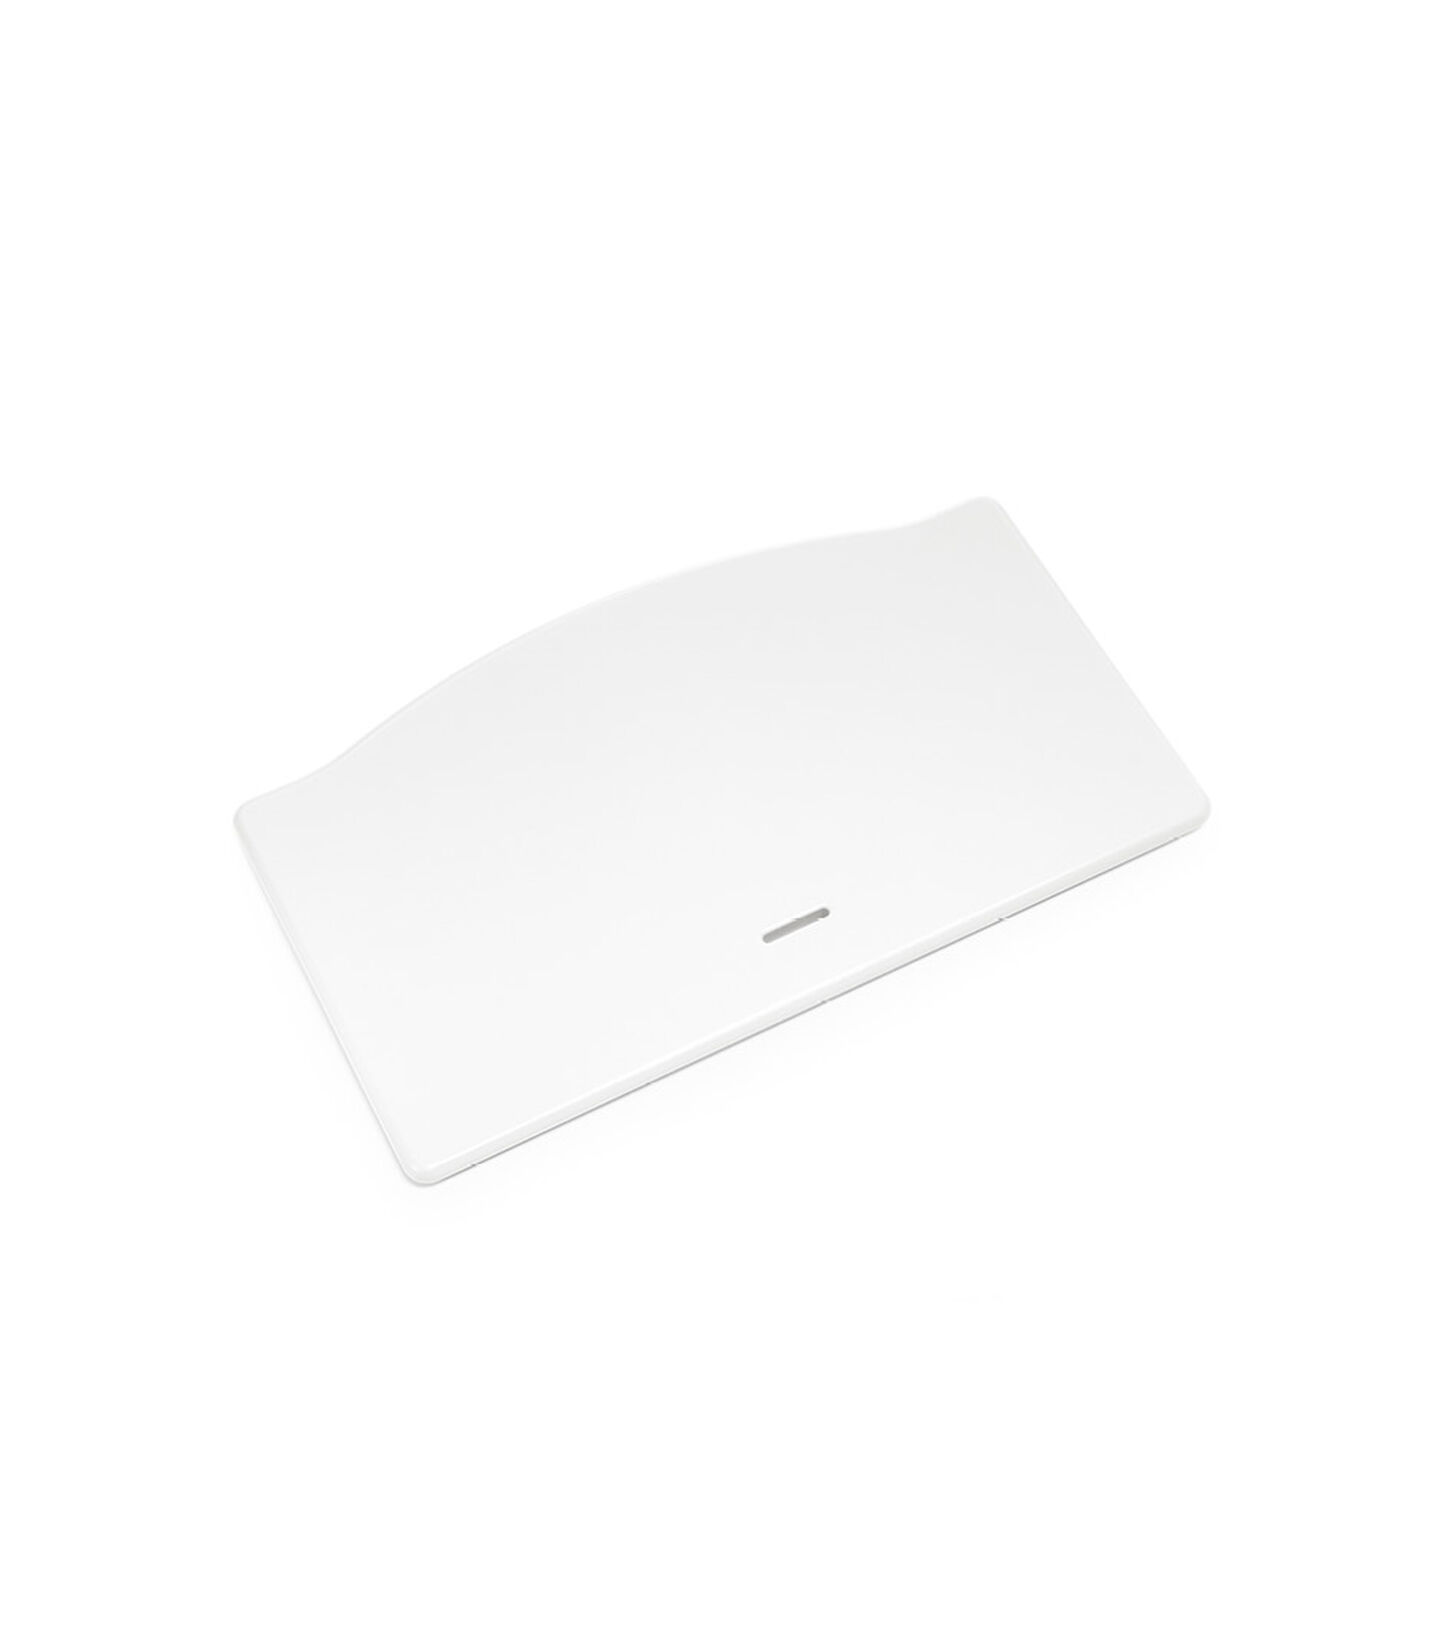 Tripp Trapp® Seatplate White, White, mainview view 1